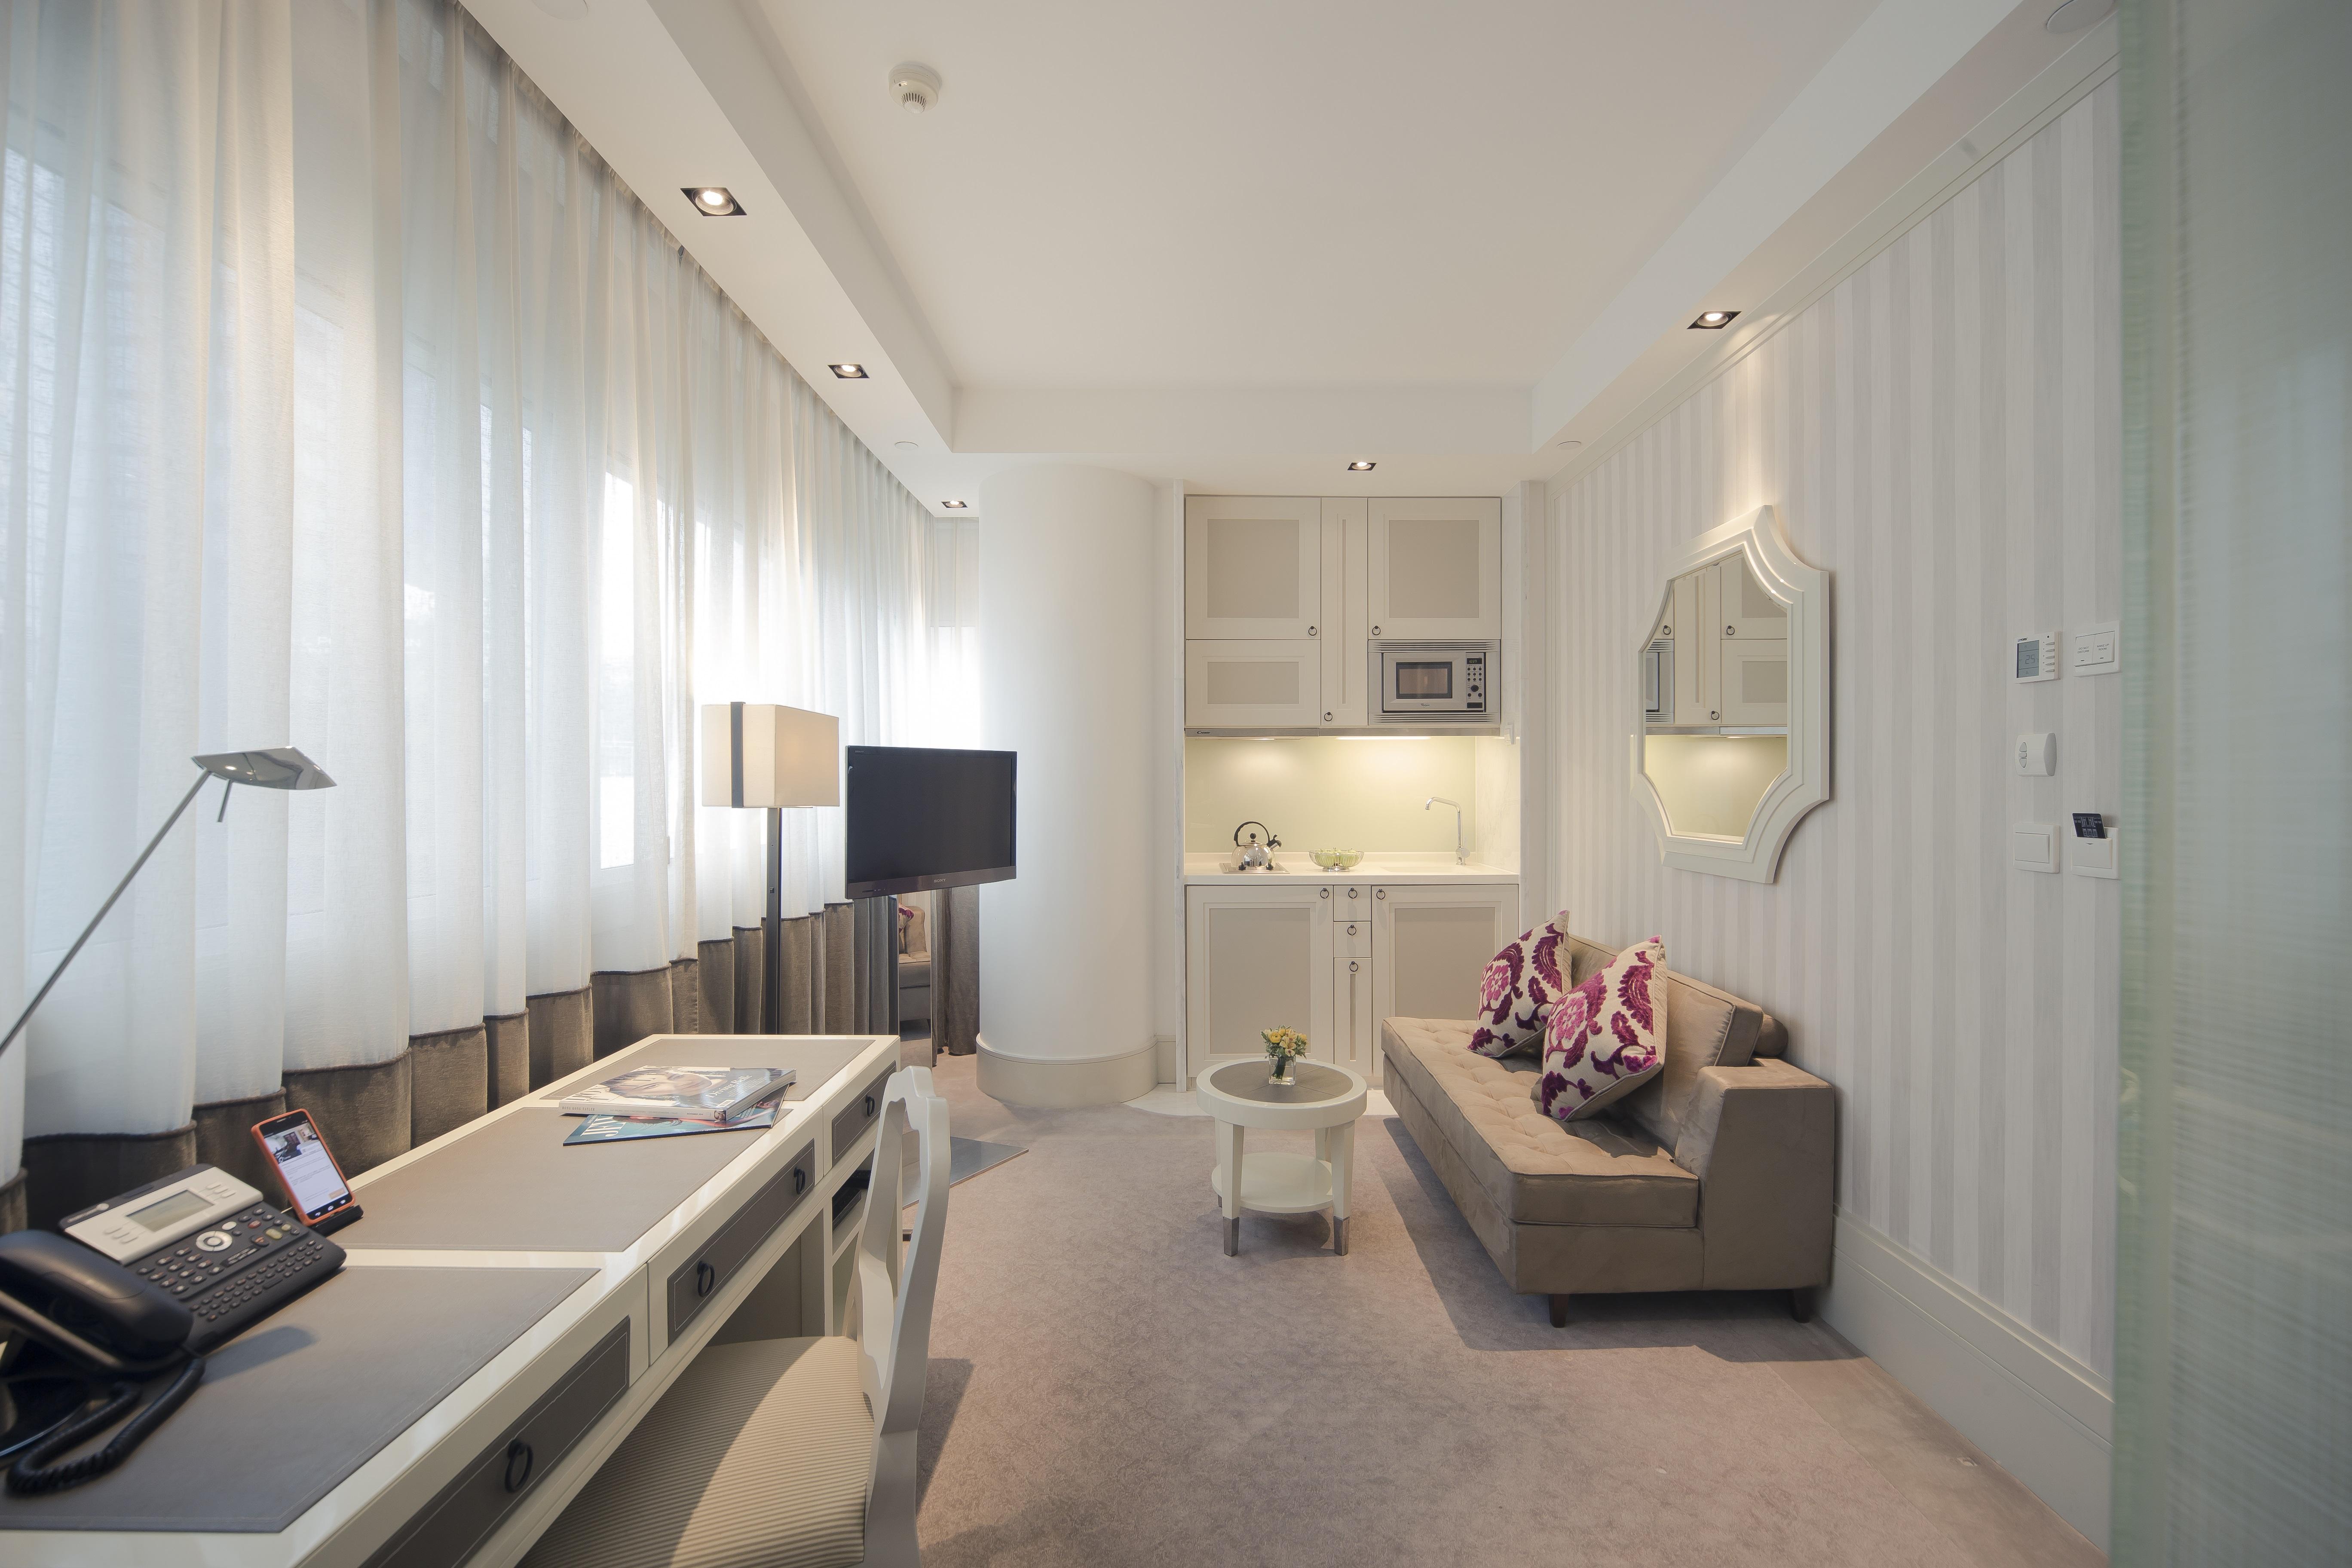 Deluxe Room 01 sitting area